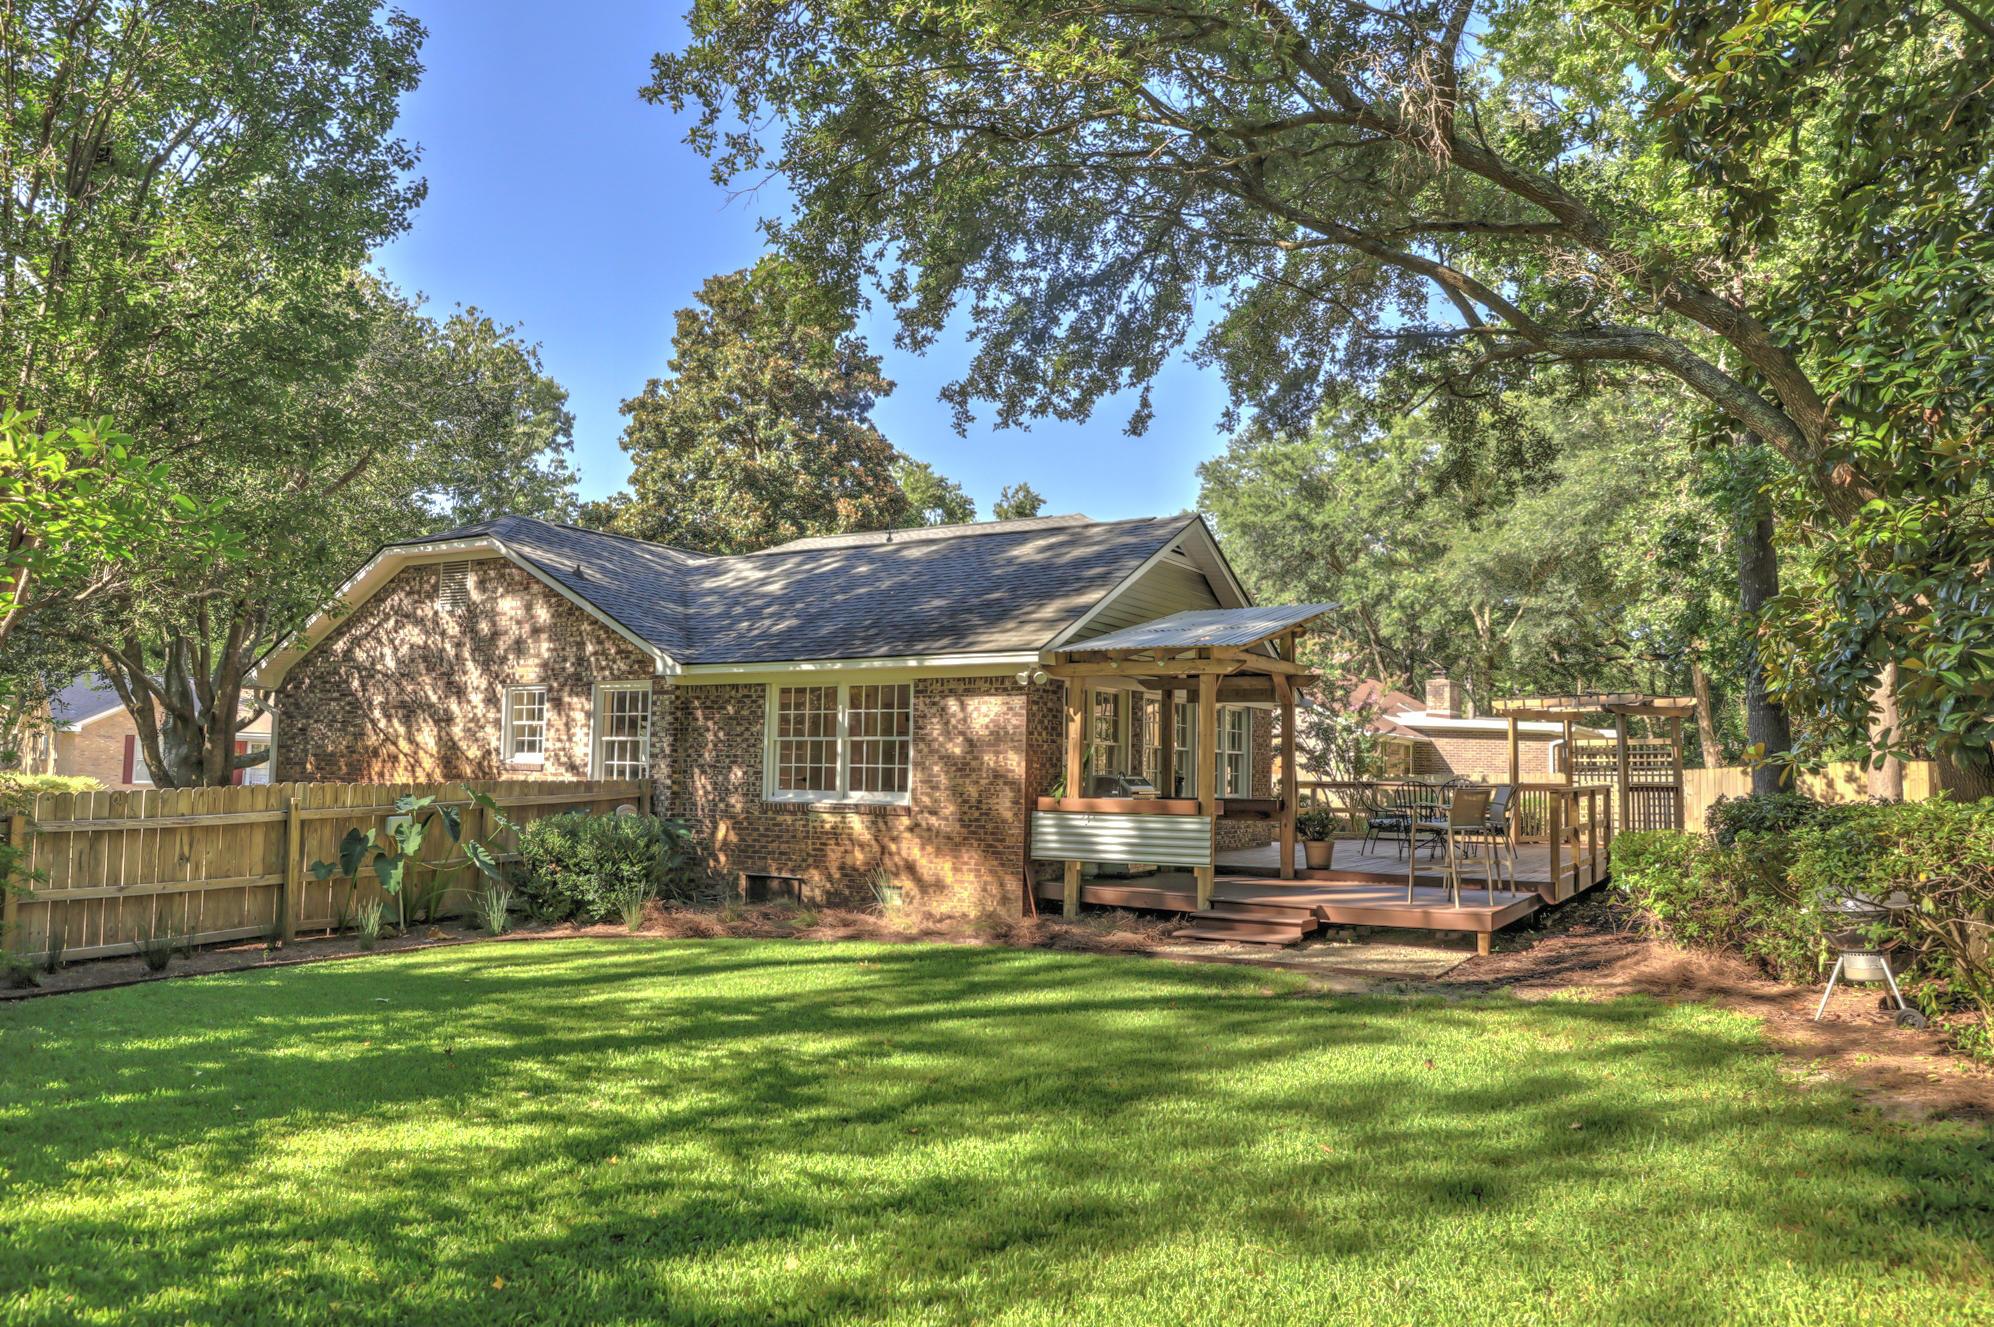 Shemwood II Homes For Sale - 1017 Jack Snipe, Mount Pleasant, SC - 3